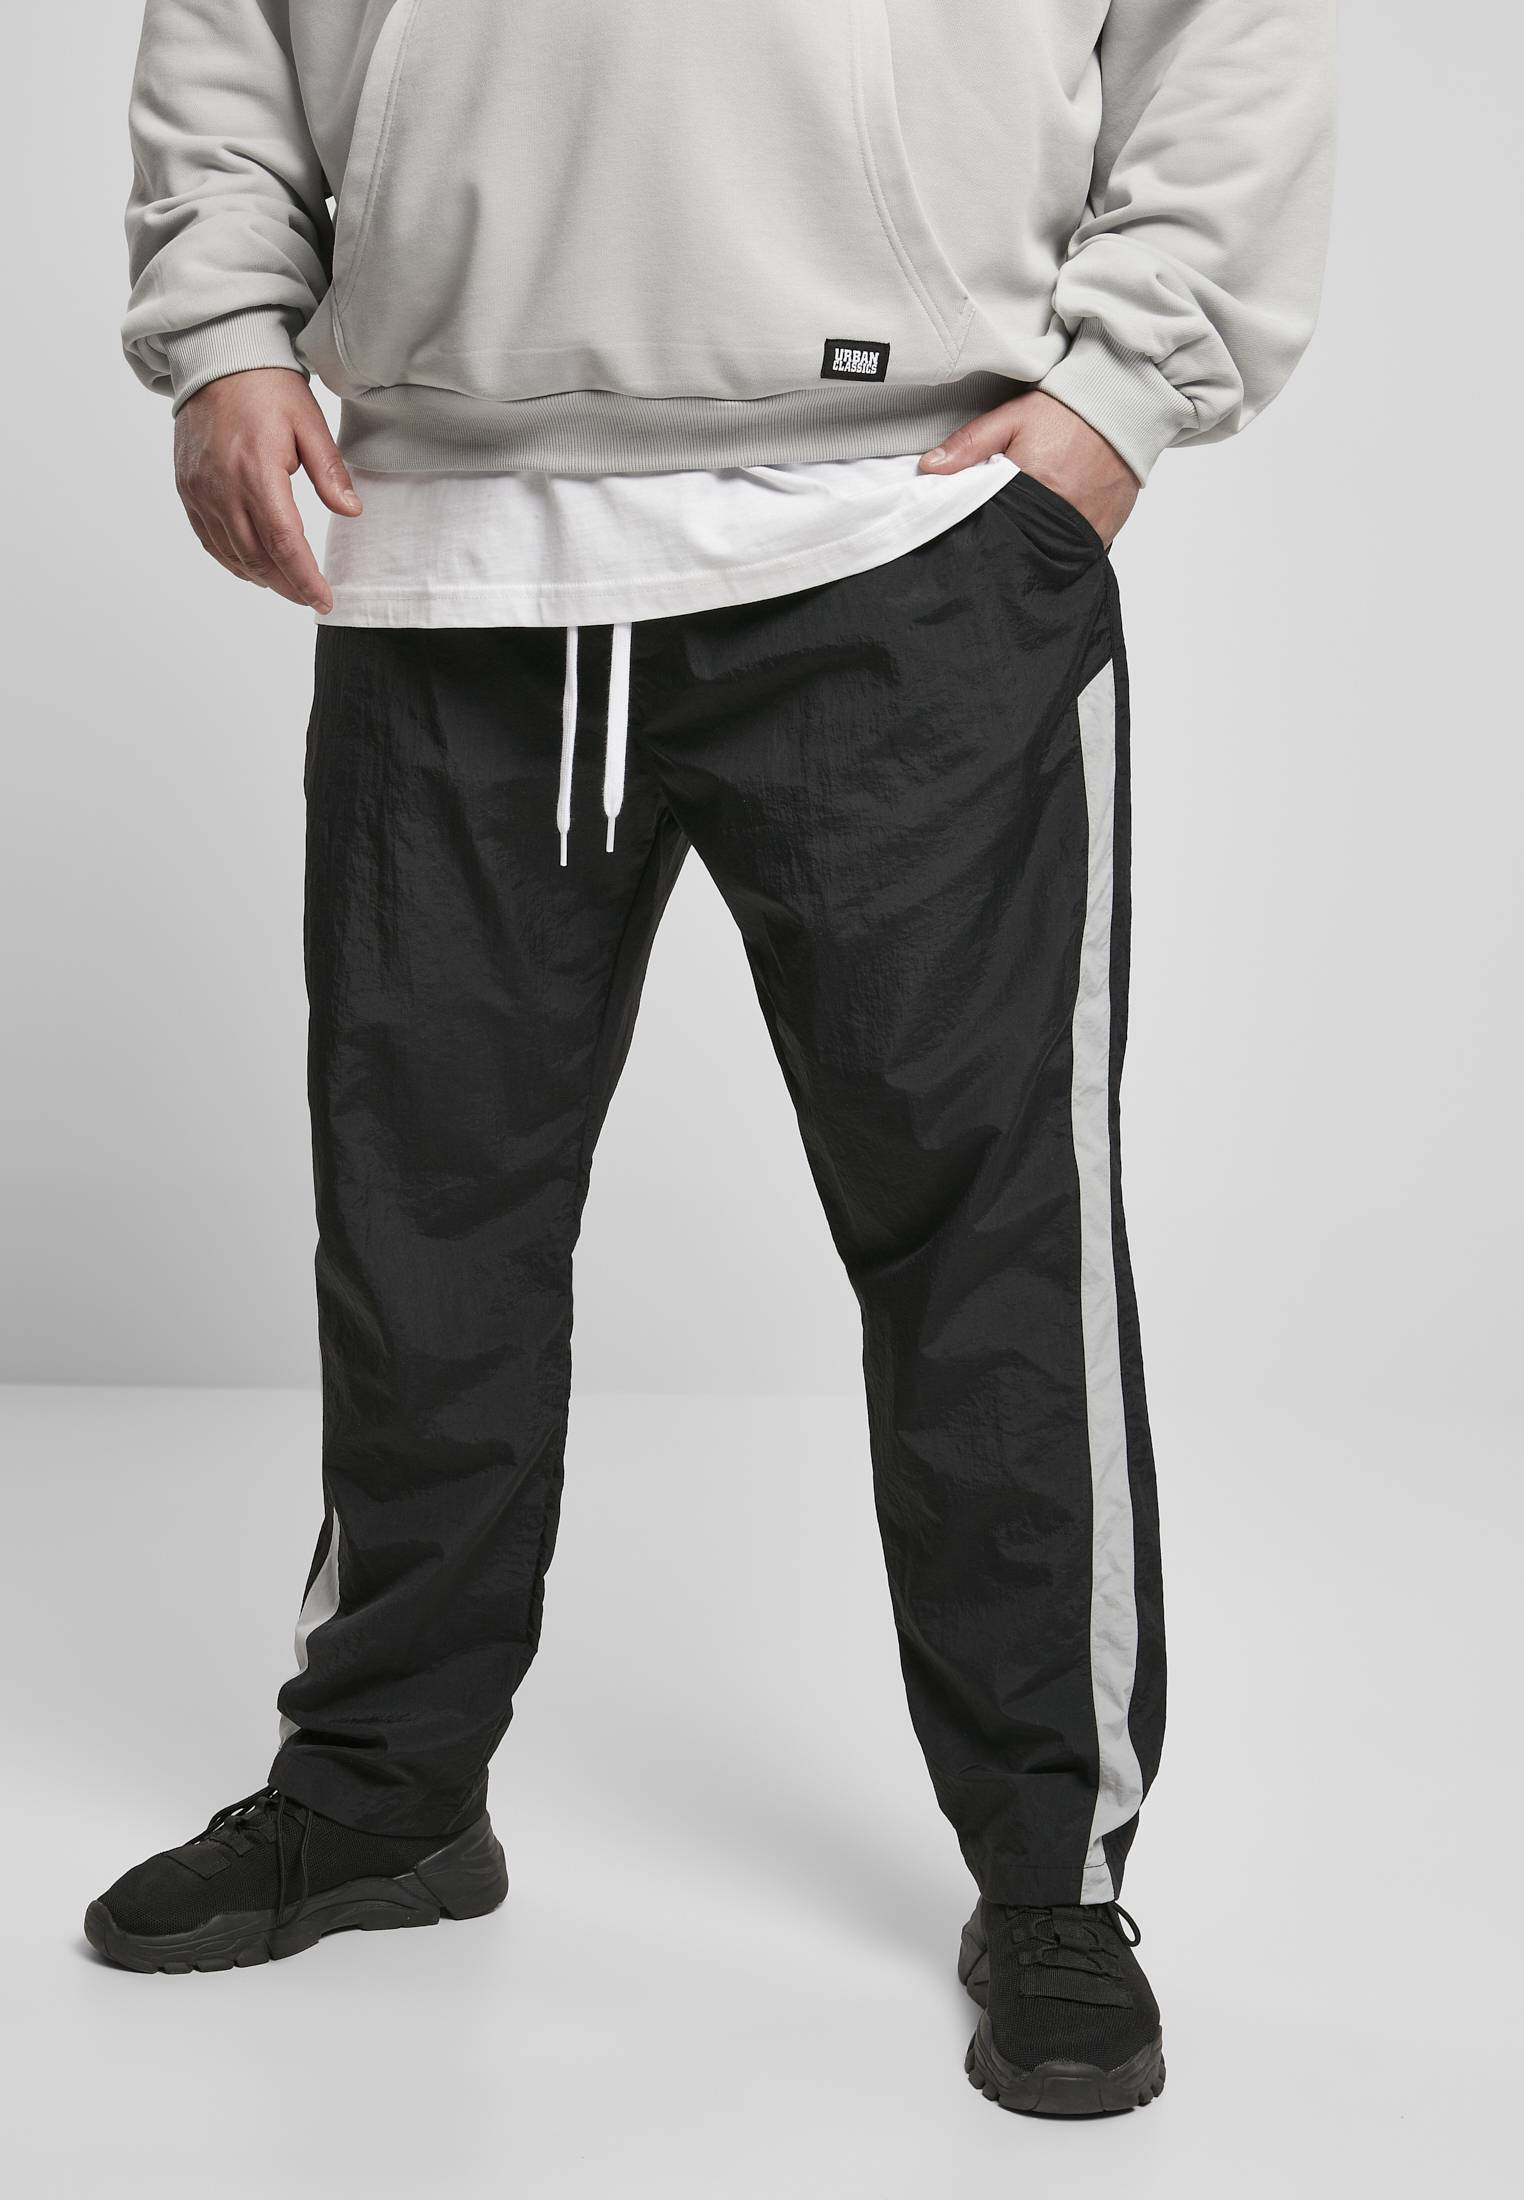 Urban Classics Side Stripe Nylon Pants black/lightasphalt - 3XL